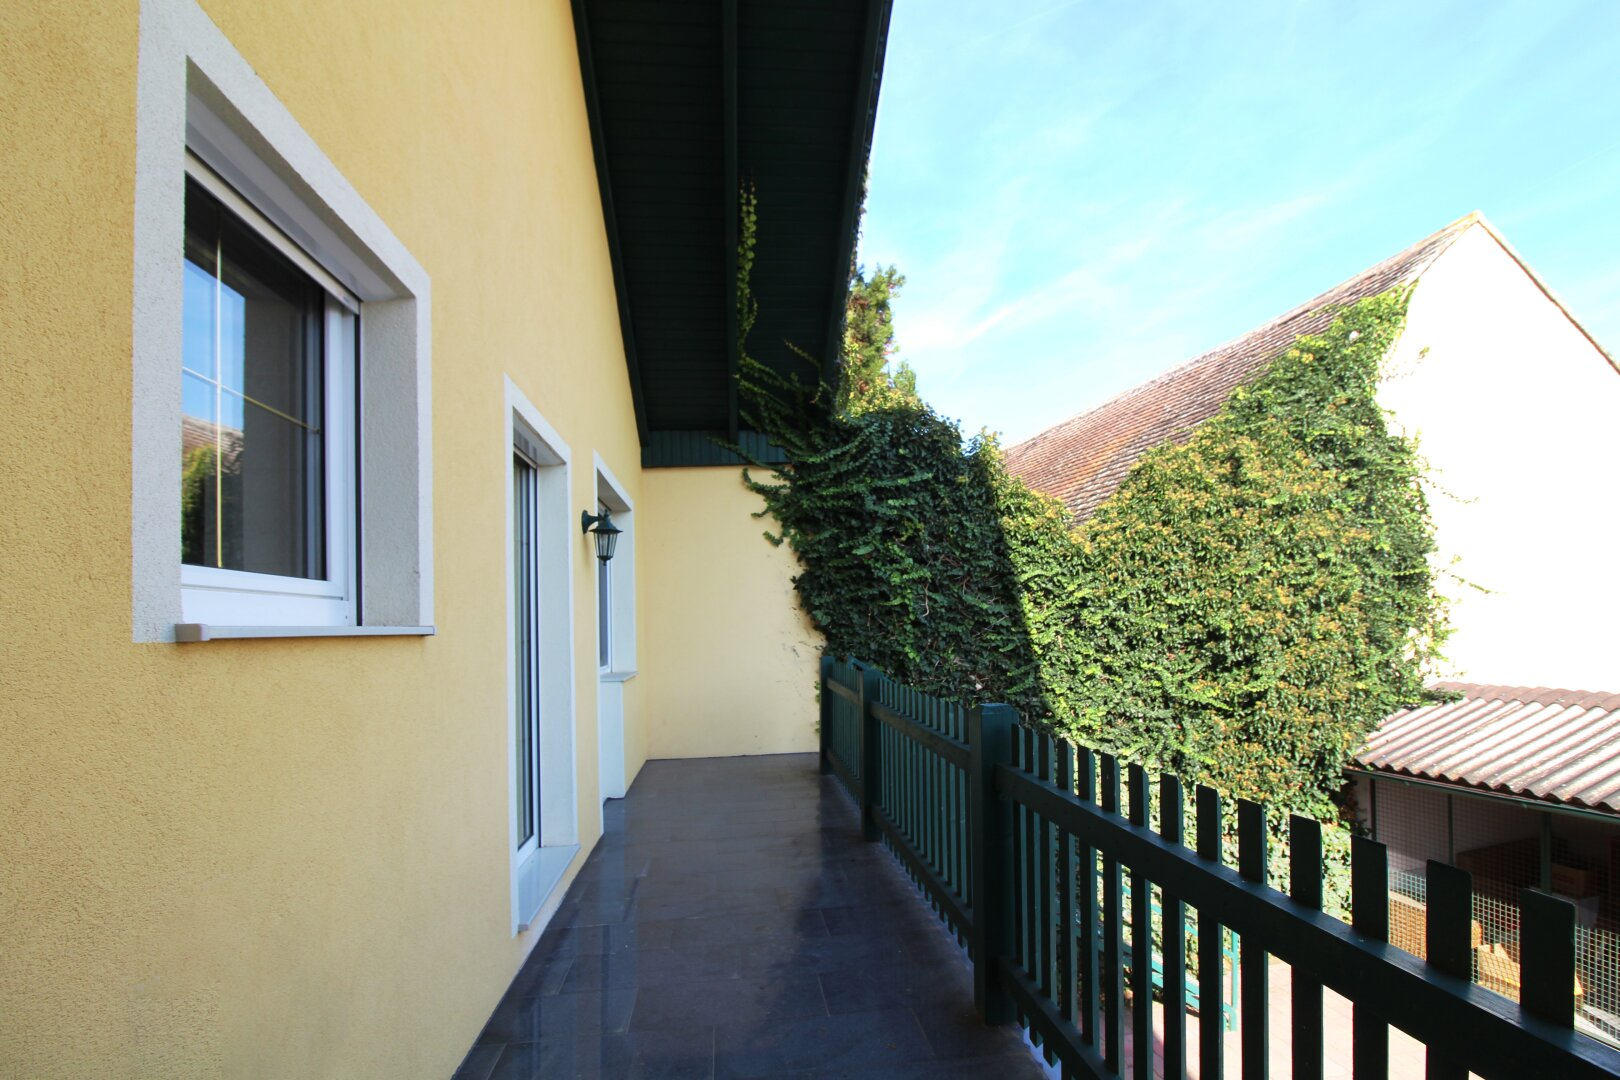 Balkon mit Stiegenabgang in den Hof